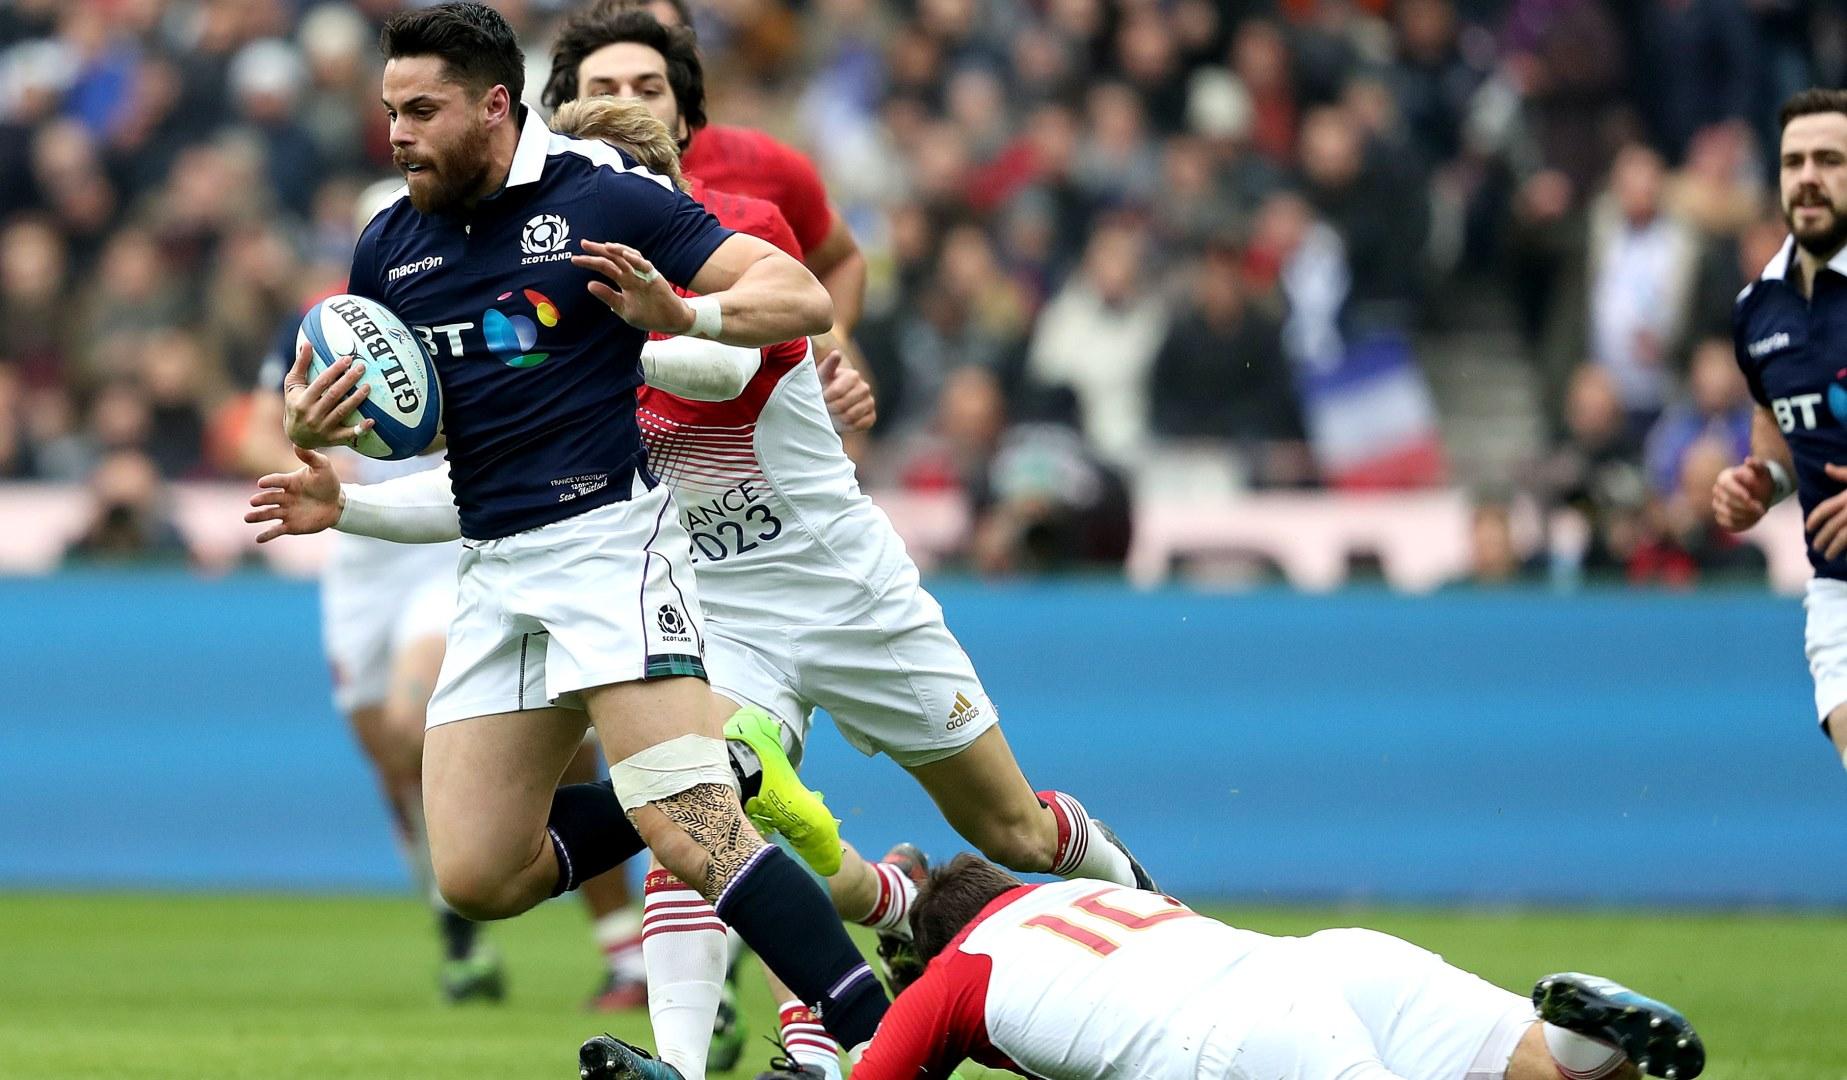 Maitland relishing battle with Scotland teammate Seymour